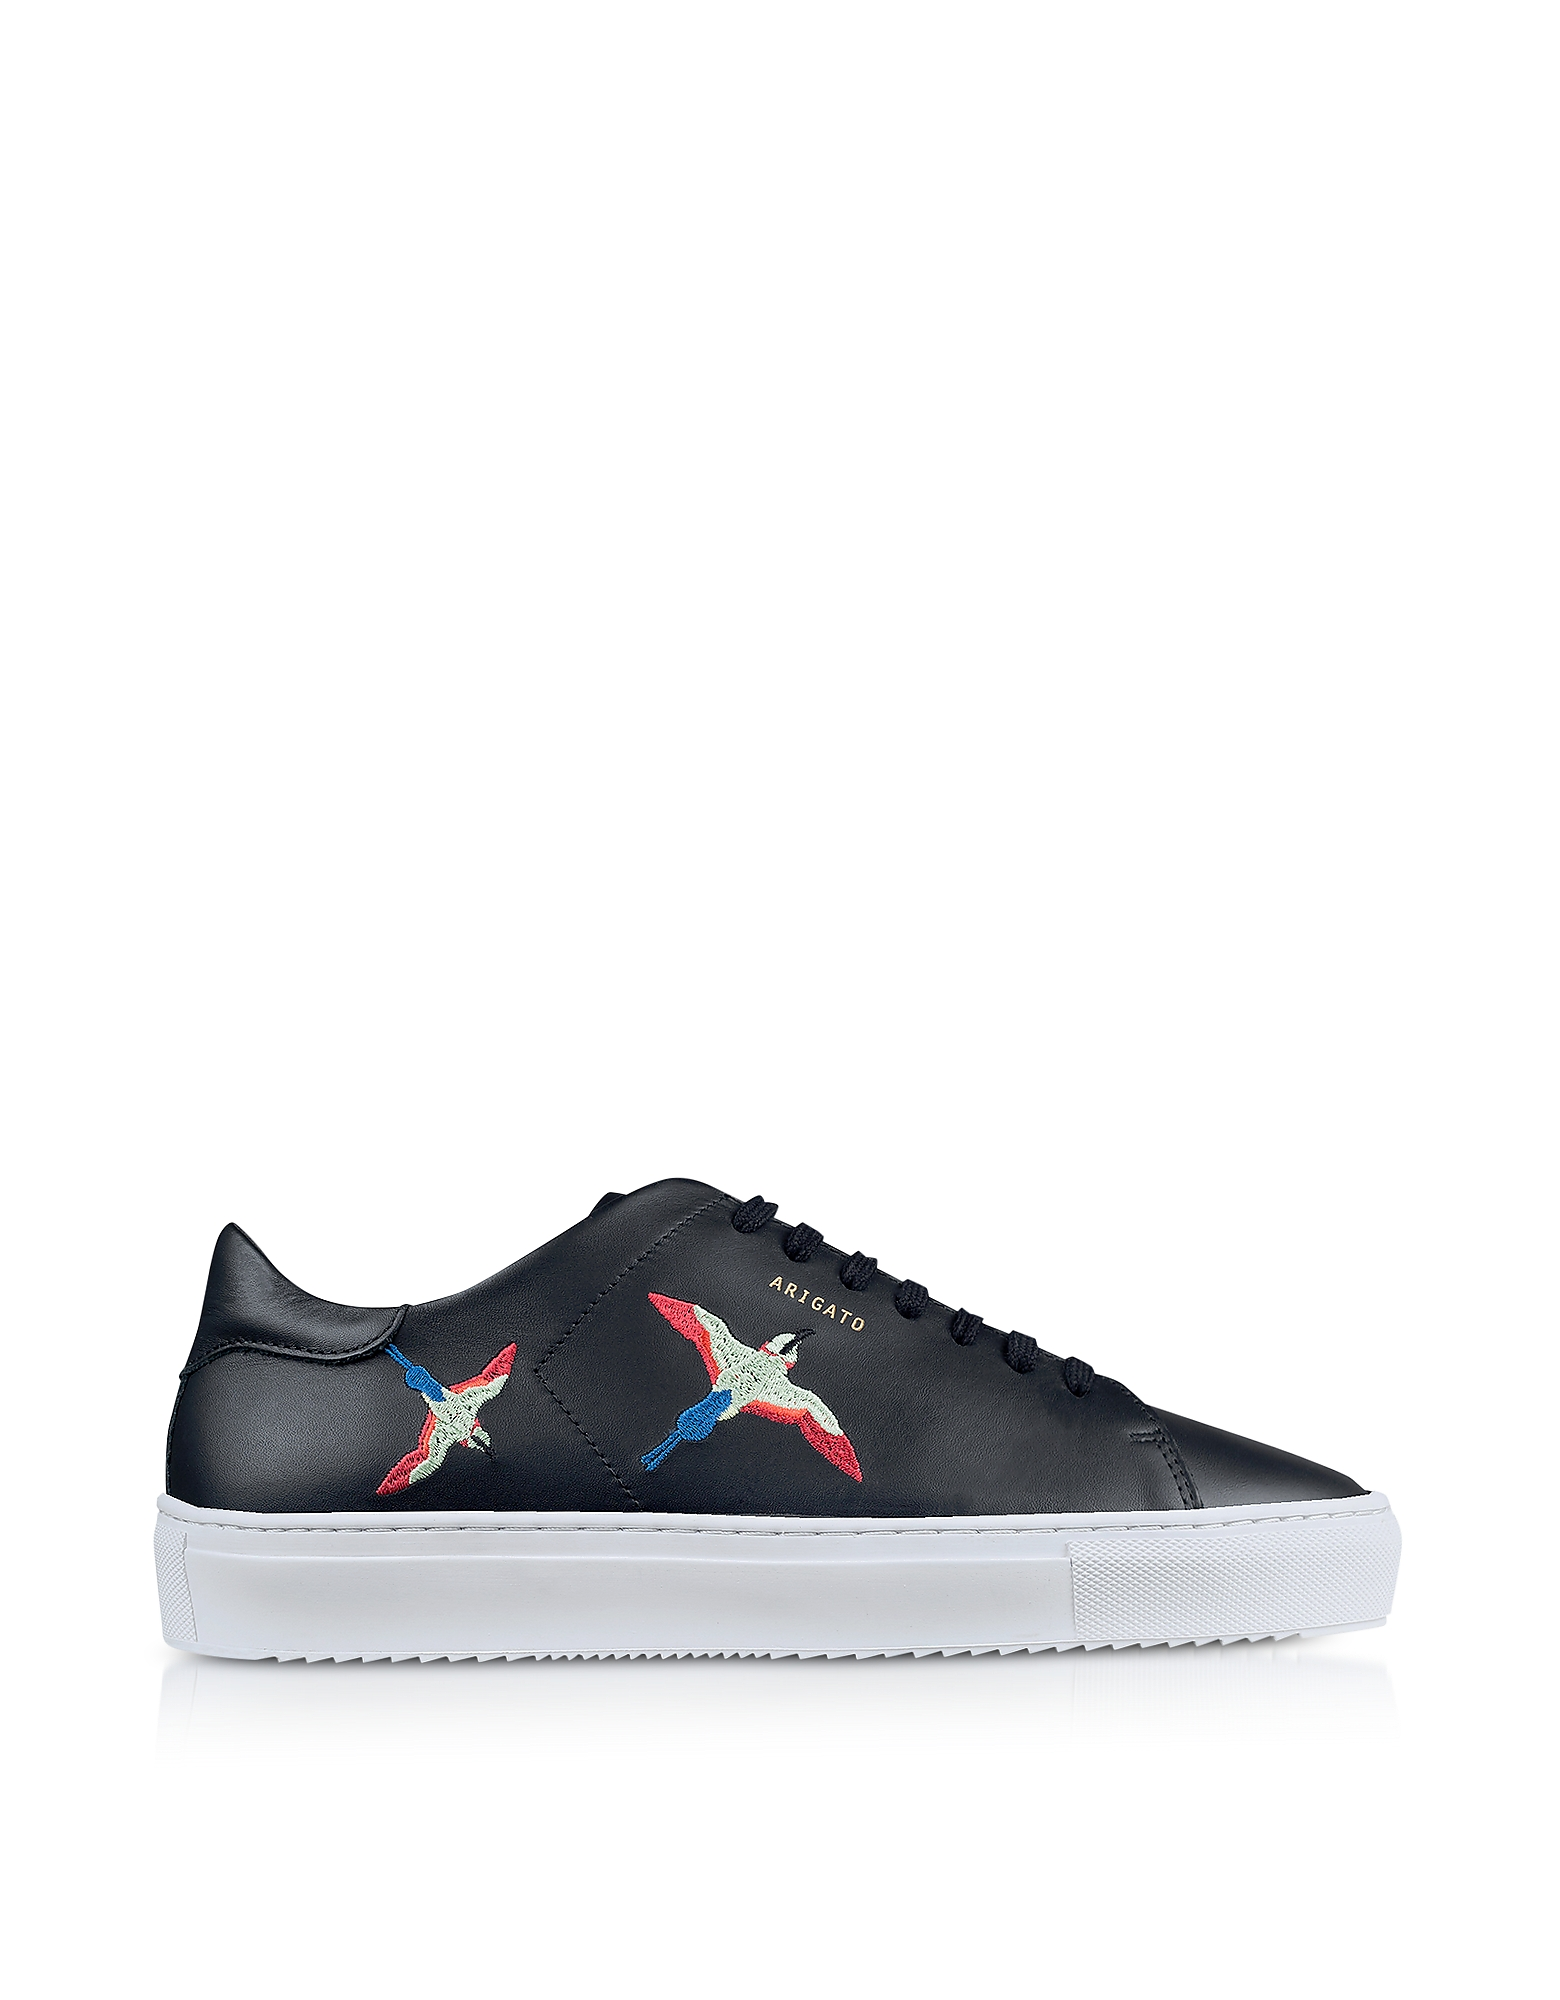 Clean 90 Black Leather Men's Sneakers